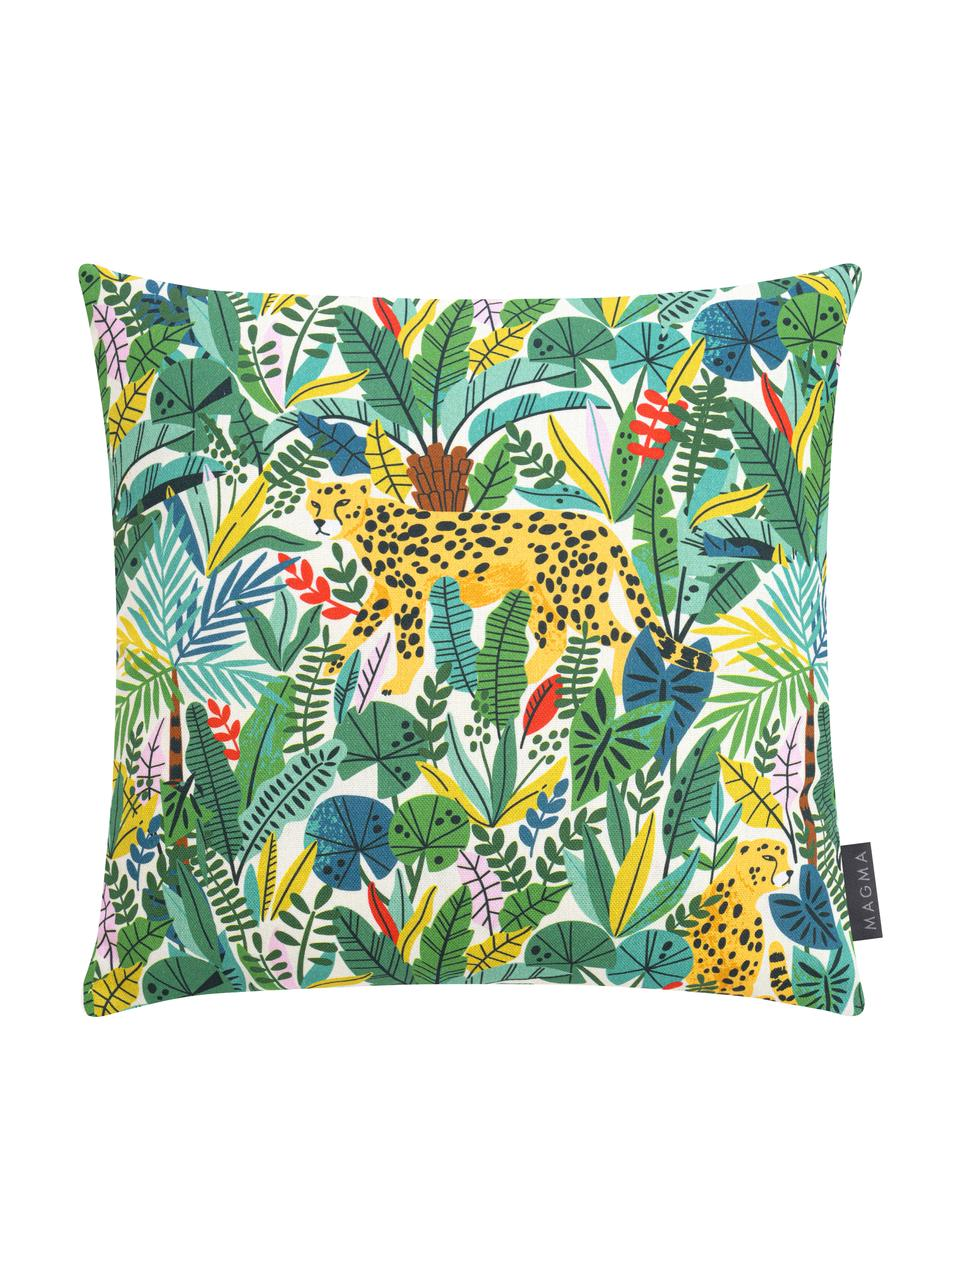 Kissenhülle Wildlife mit Jungle Motiv, Webart: Halbpanama, Grün, Mehrfarbig, 40 x 40 cm